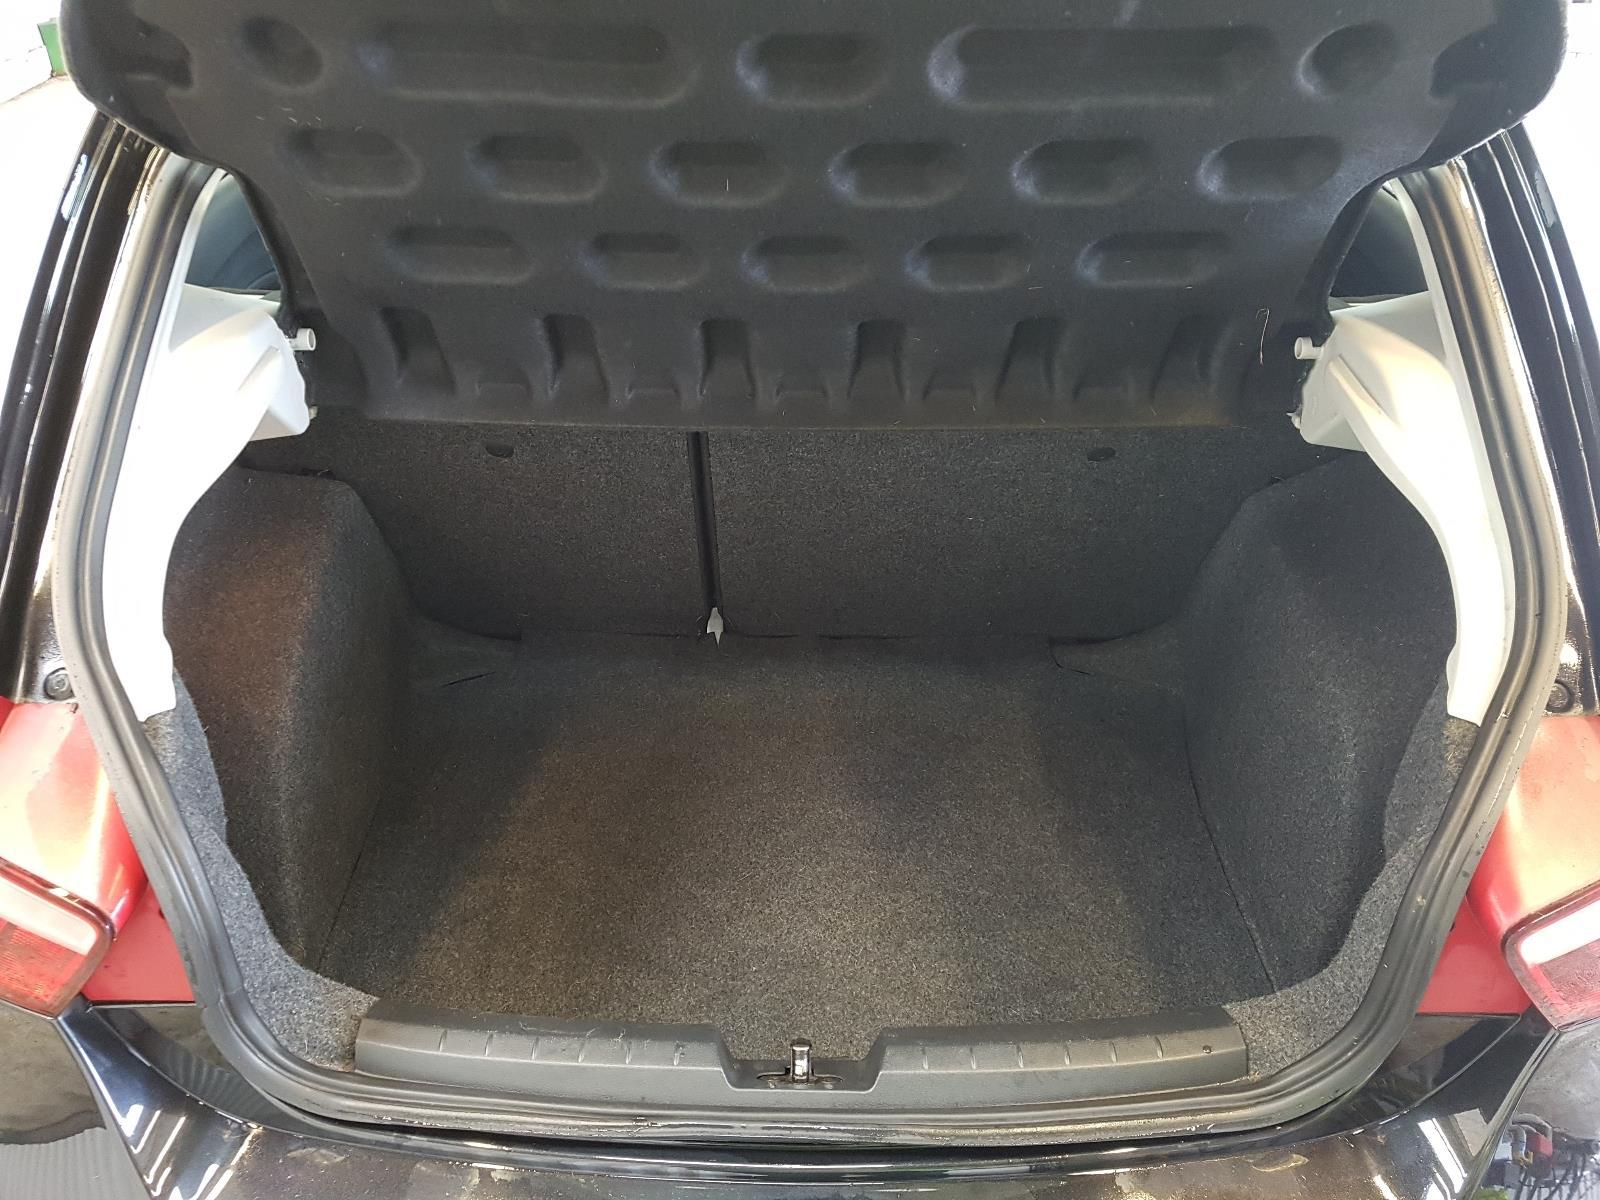 SEAT MK4 (Typ 6J) (SE25) 2008 TO 2017 SPORT CR TDI 3 DOOR HATCHBACK